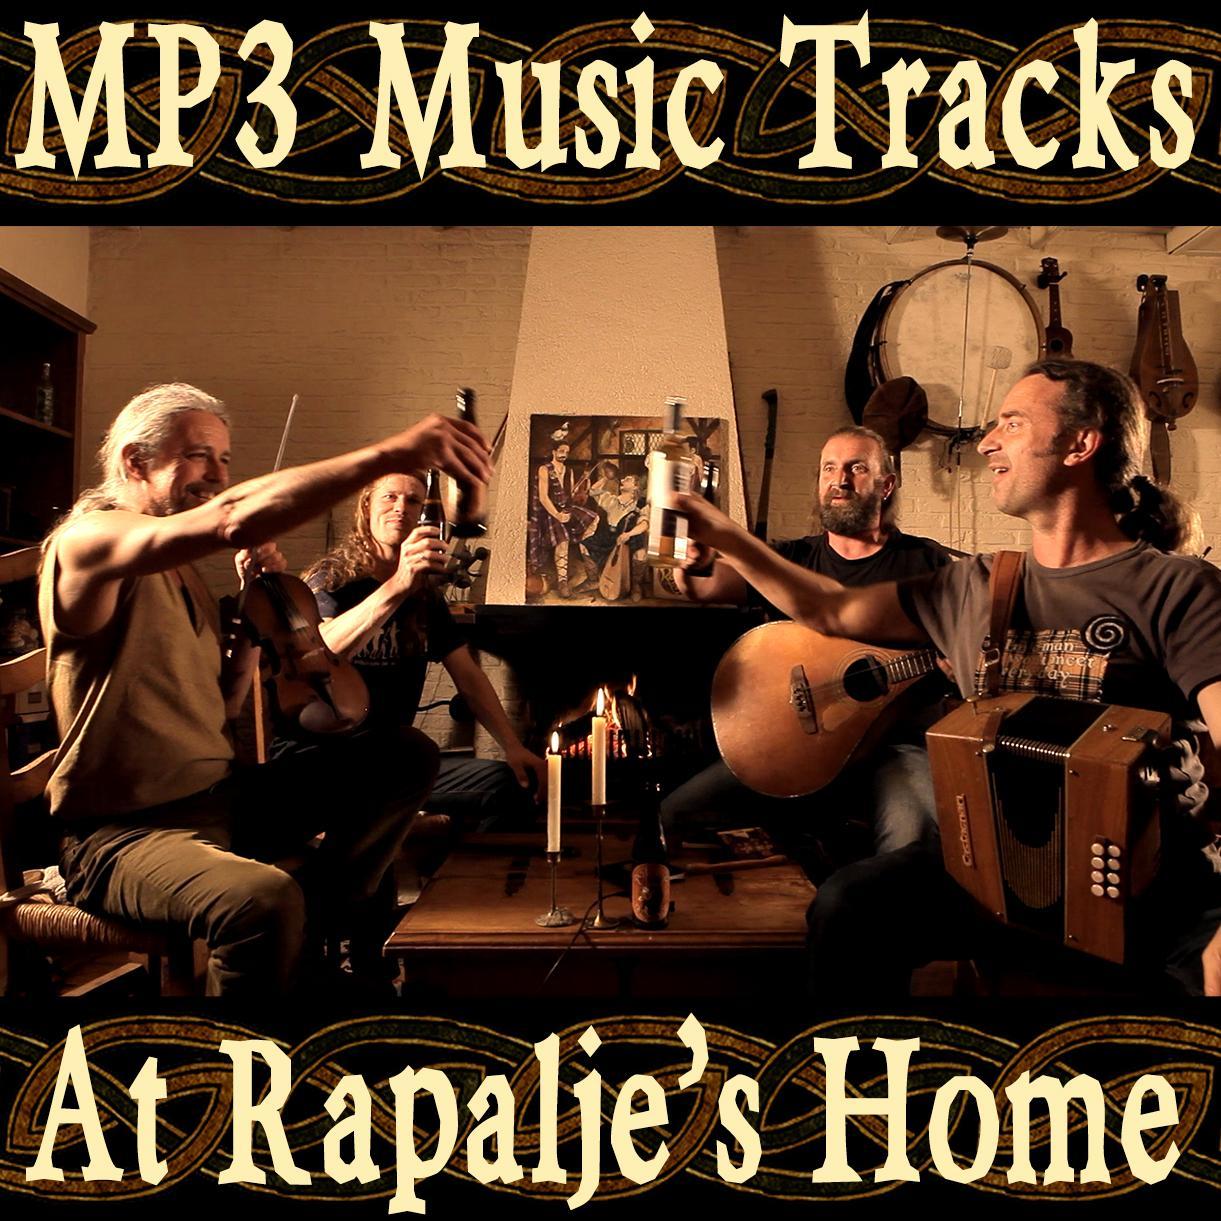 MP3-Music-Tracks-At-Rapaljes-Home-1.jpg